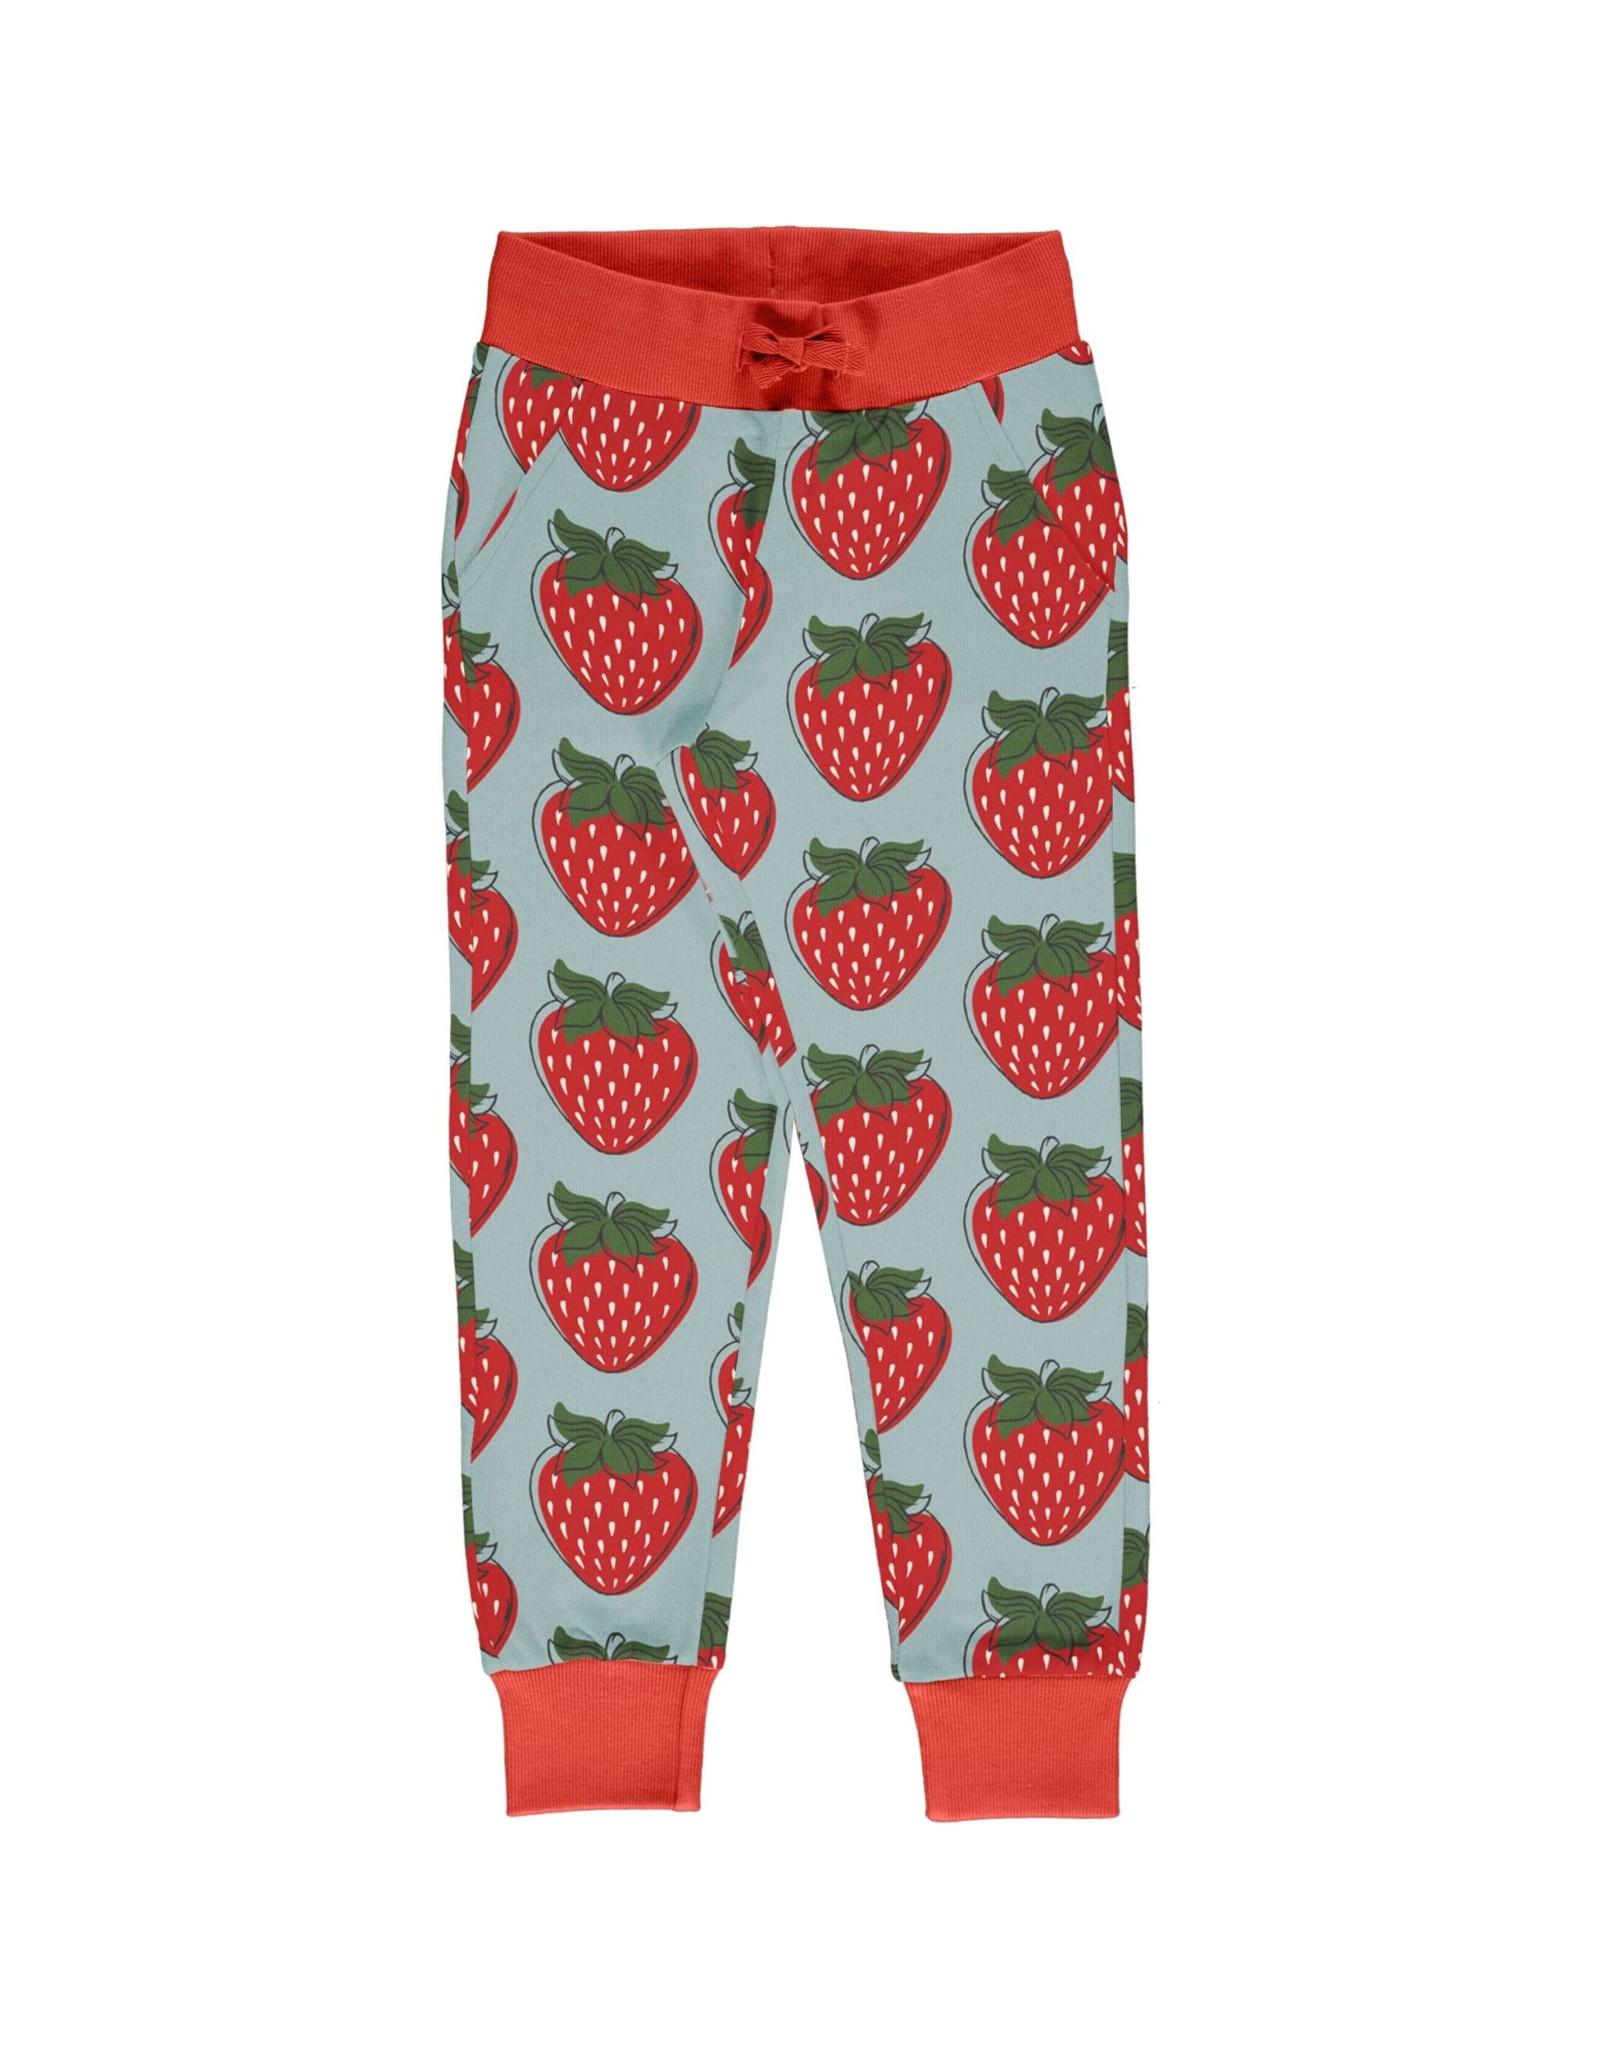 Maxomorra Jogging broek met aardbeien print van Maxomorra